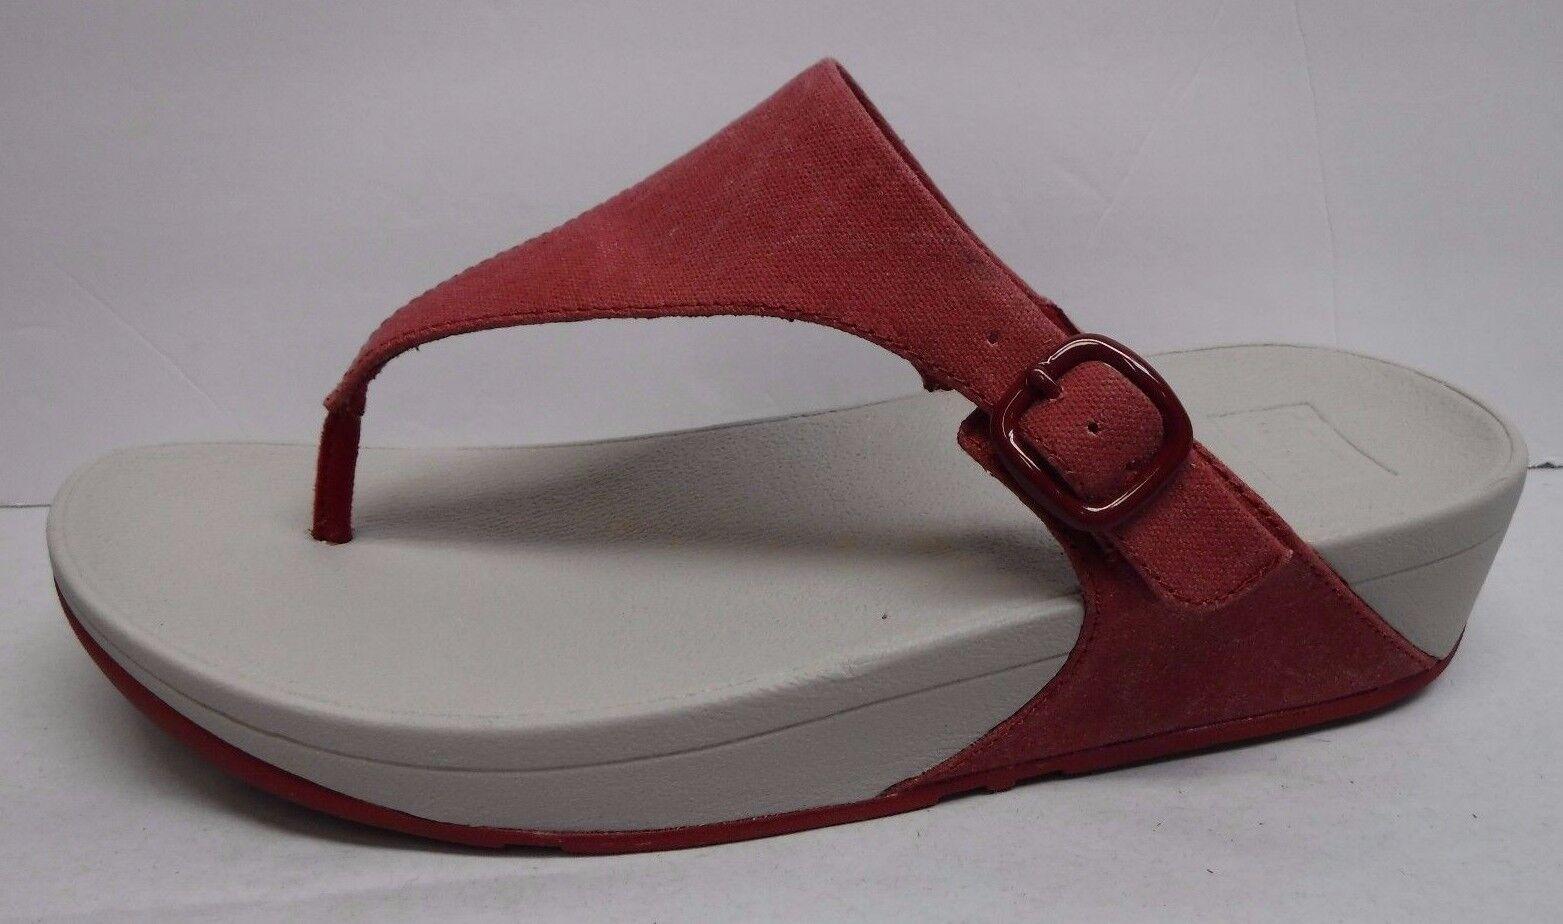 Fitflop Fit Flop Größe 10 ROT Sandales NEU Damenschuhe Schuhes